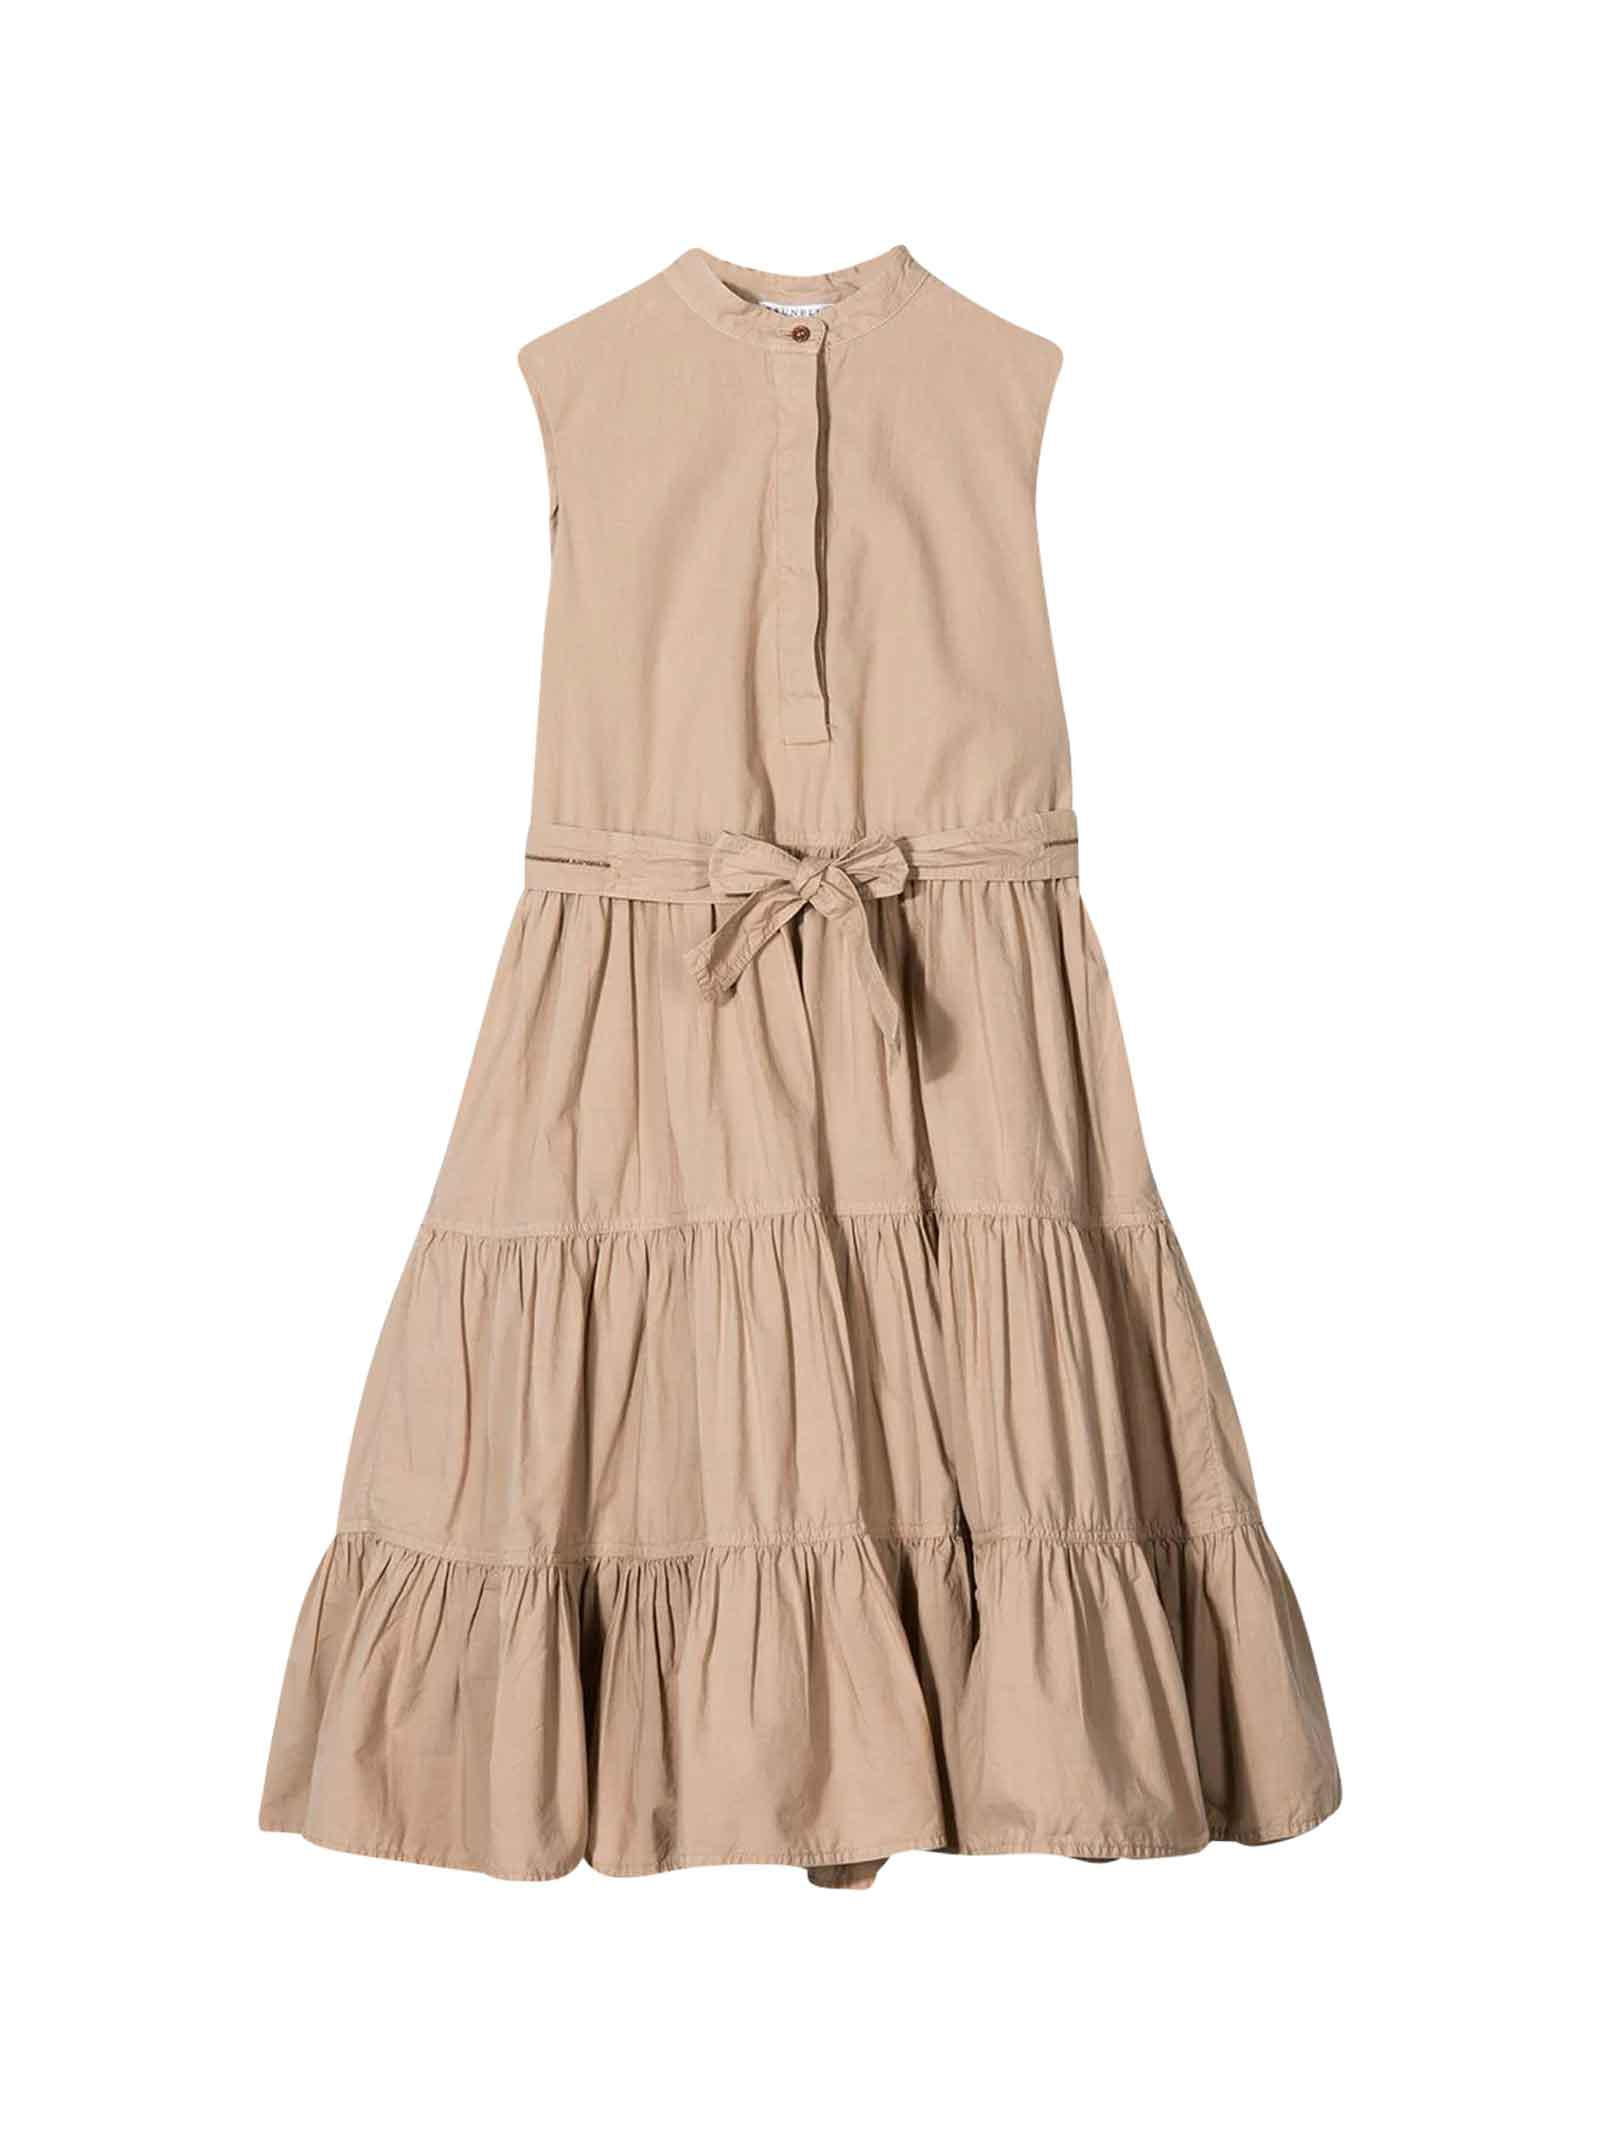 Brunello Cucinelli Pink Flared Sleveless Dress